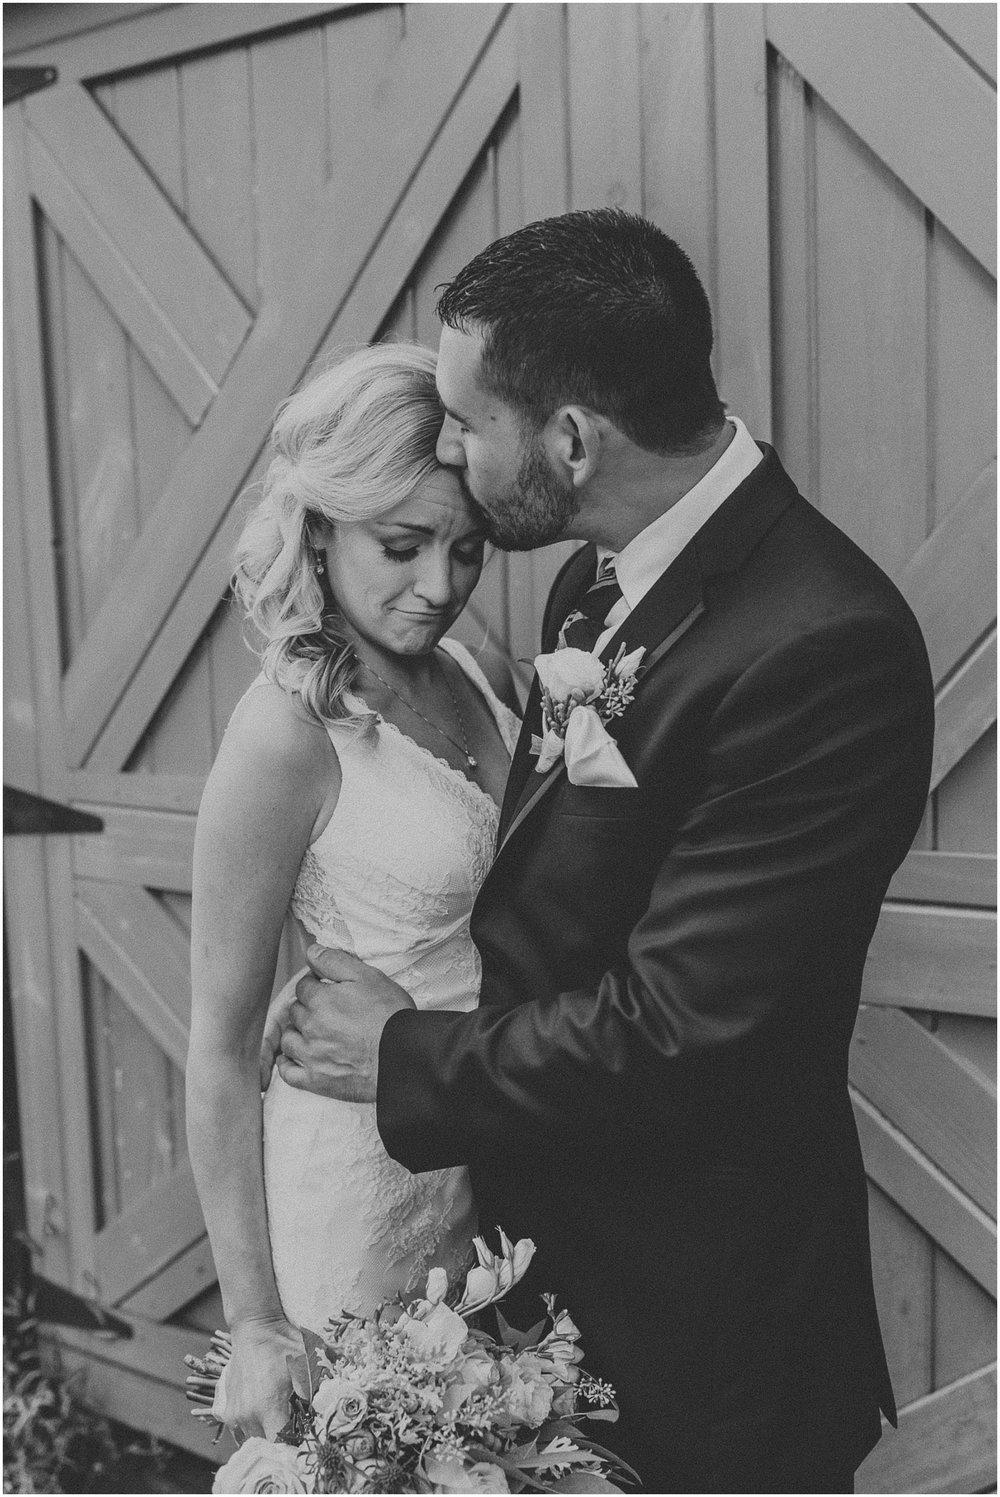 waterloo-village-waterloo village-wedding-outdoor wedding-rustic-boemian-new jersey-bride-groom-wedding party-davids bridal-wedding dress-wedding-first kiss-intimate wedding_0360.jpg